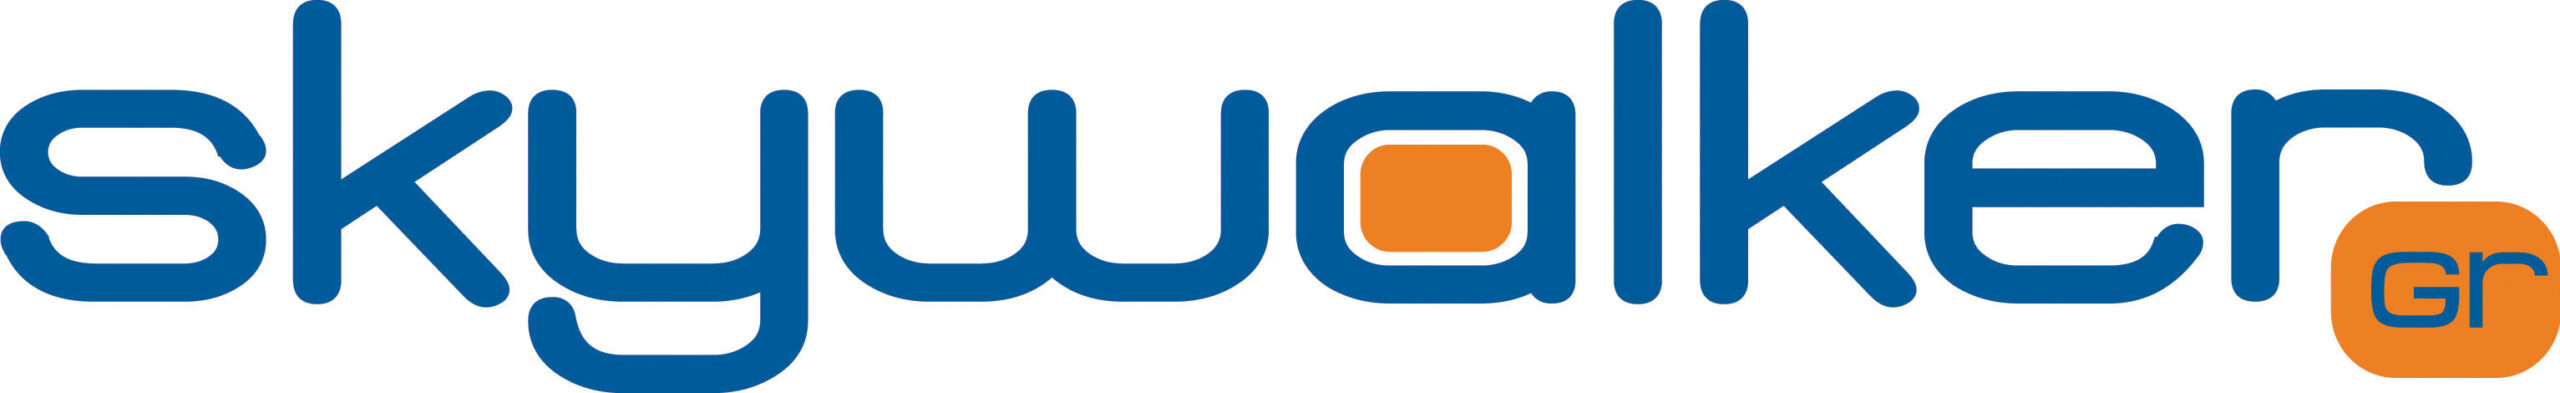 skywalker logo